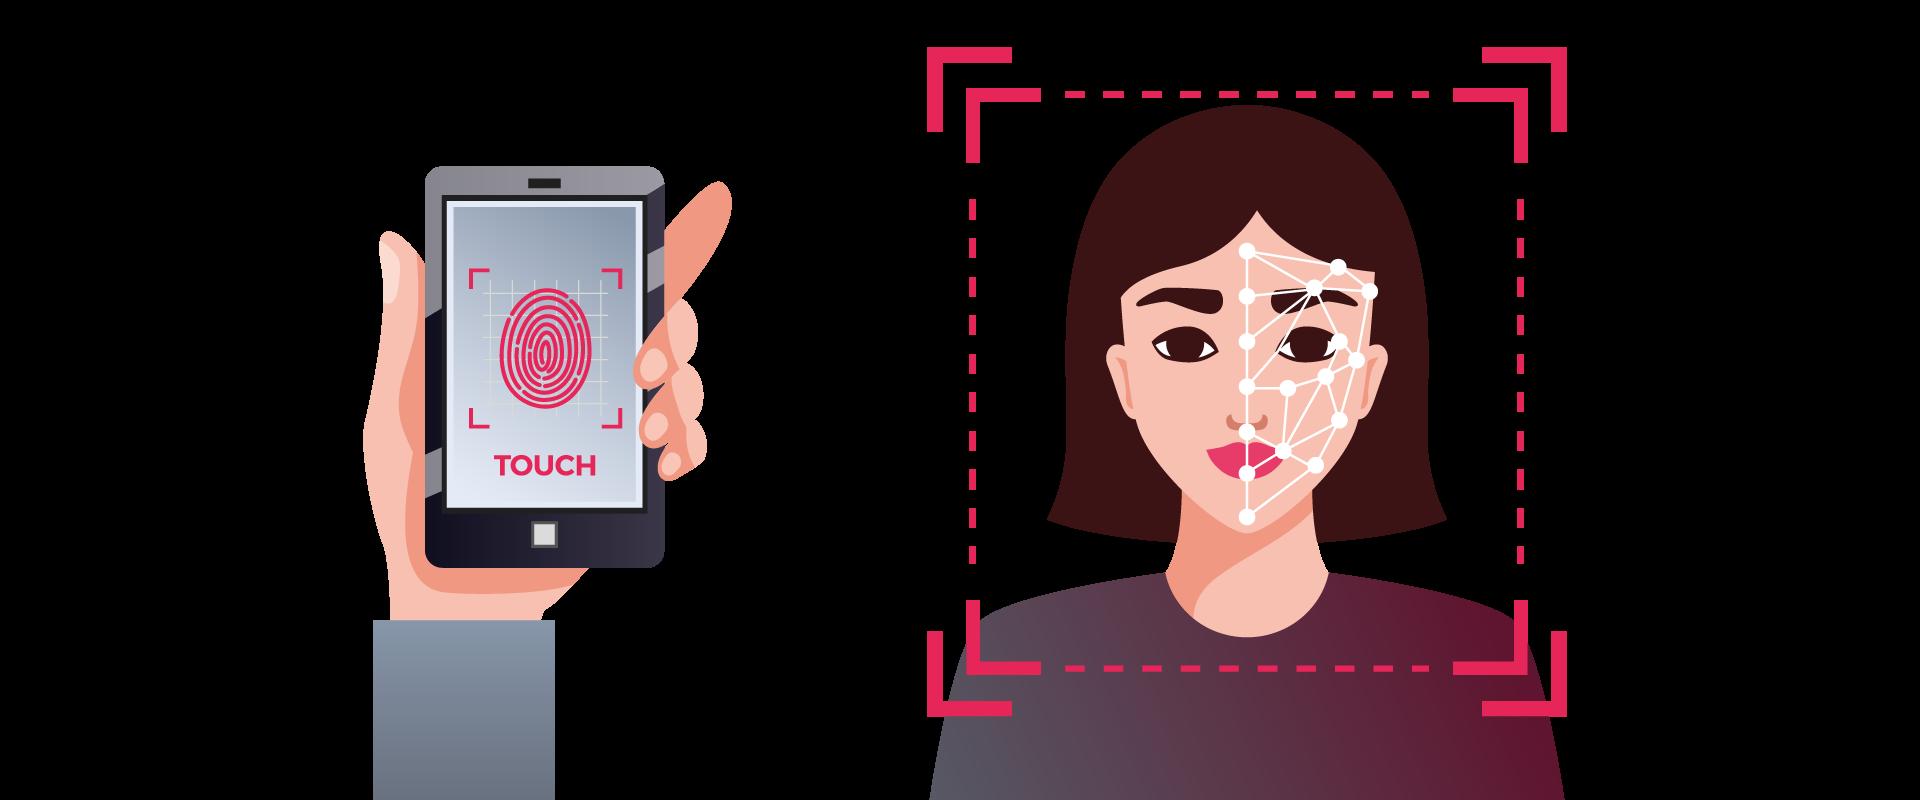 https://recfaces.com/wp-content/uploads/2020/12/mobile-biometric-solutions.png